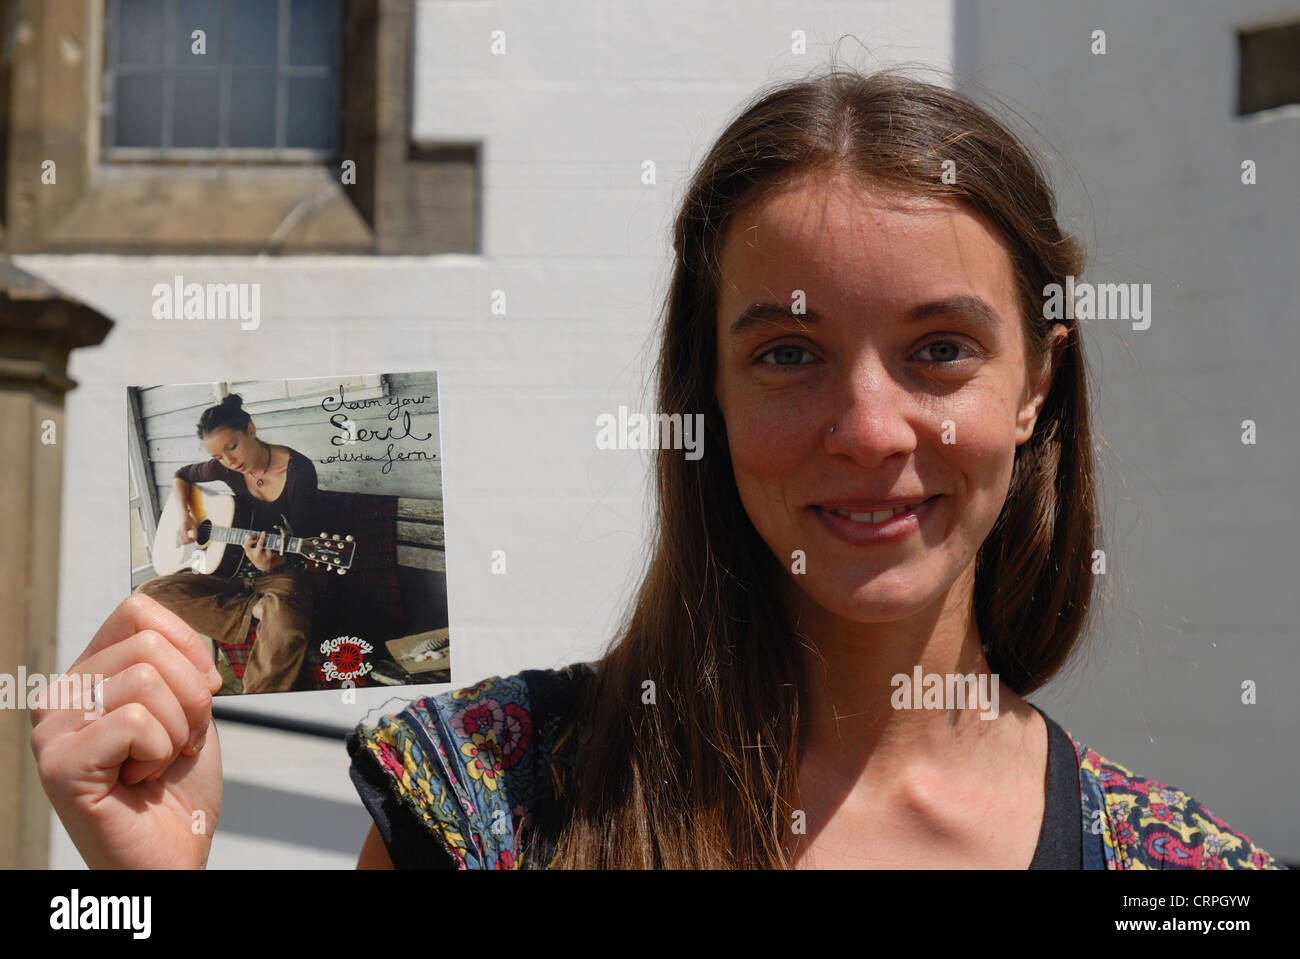 Urmila Kanitkar Urmila Kanitkar new picture